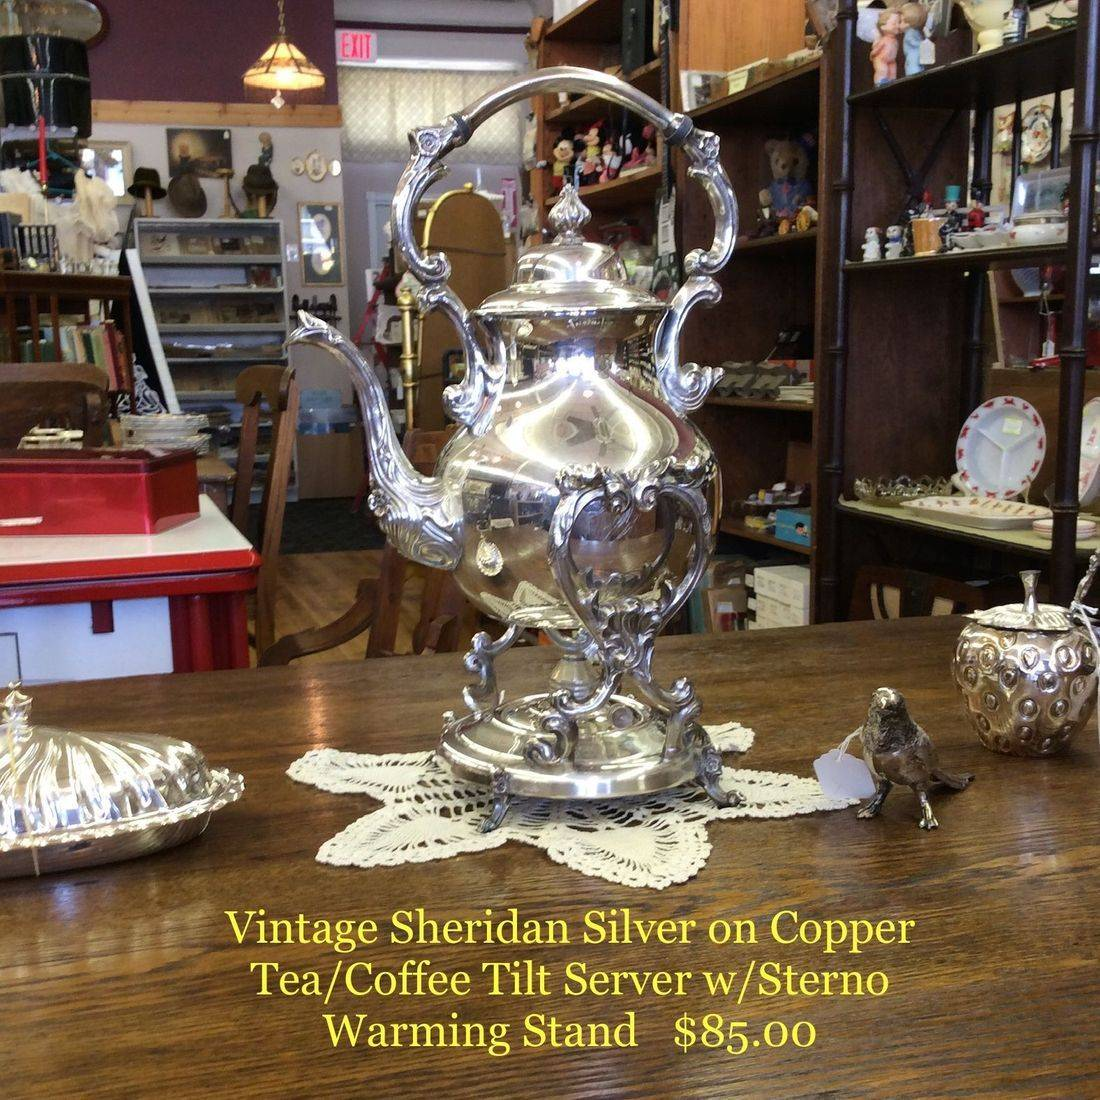 Vintage Sheridan Silver on Copper Tea/Coffee Tilt Server w/Sterno Warming Stand   $85.00